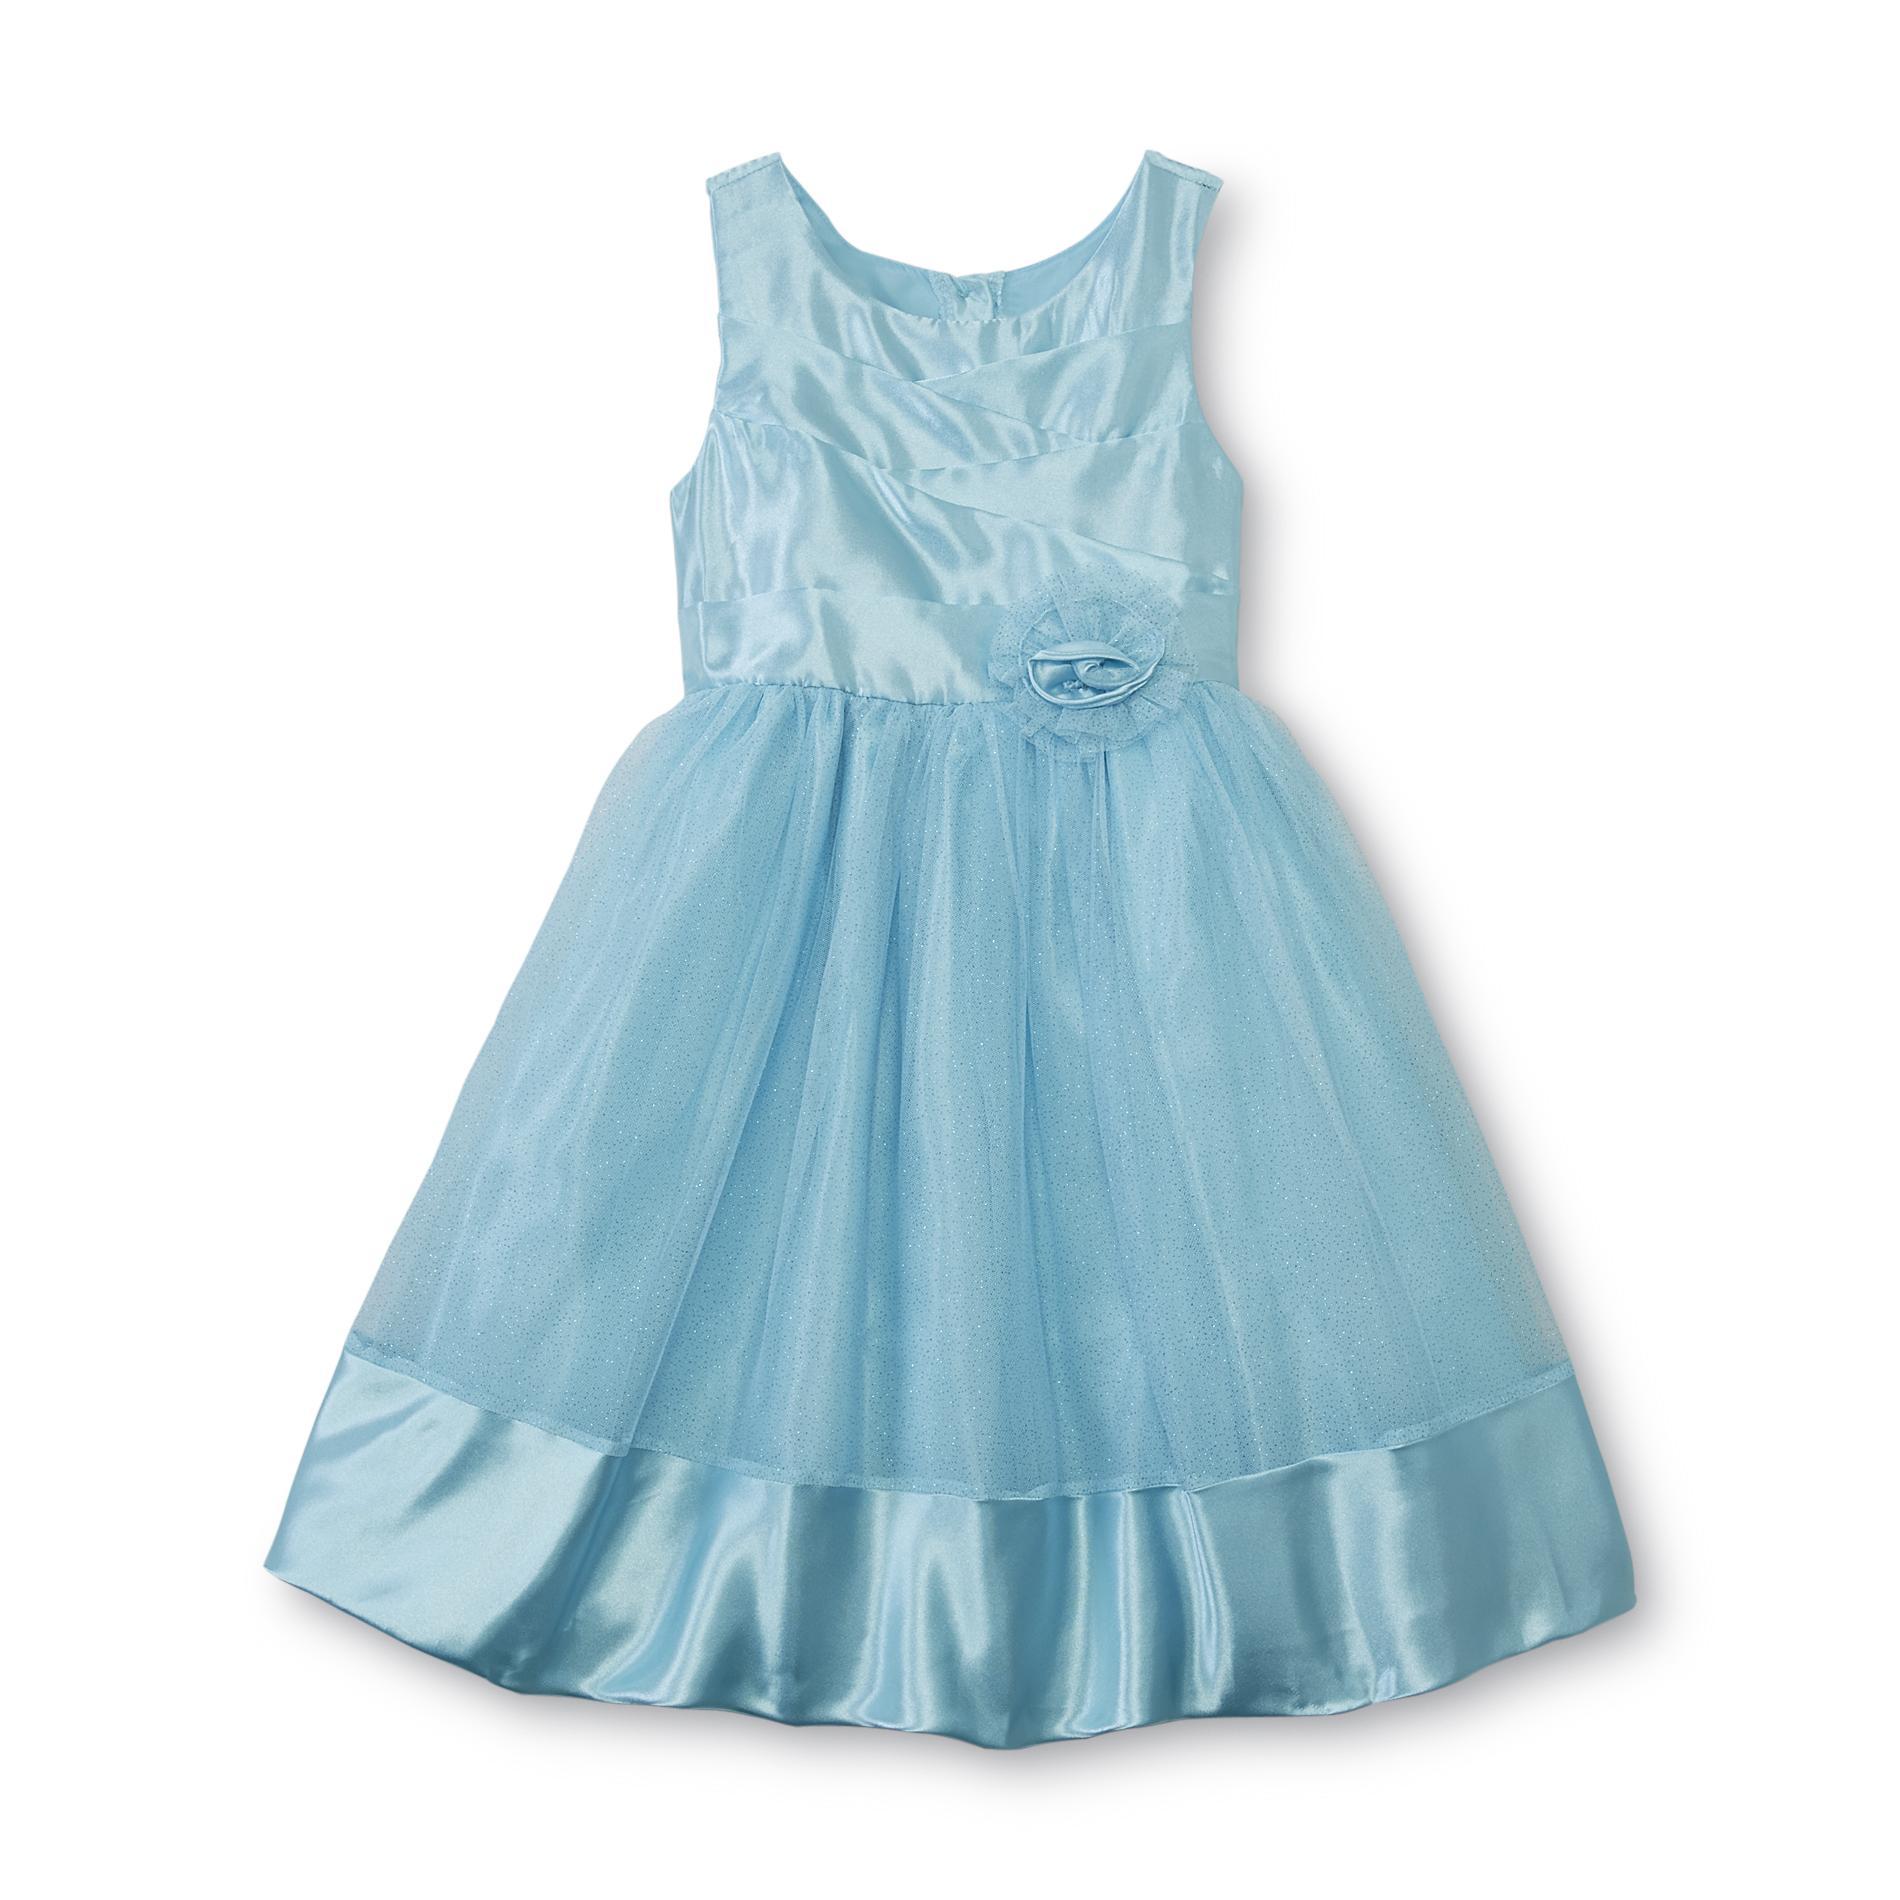 Youngland Girl's Sleeveless Party Dress